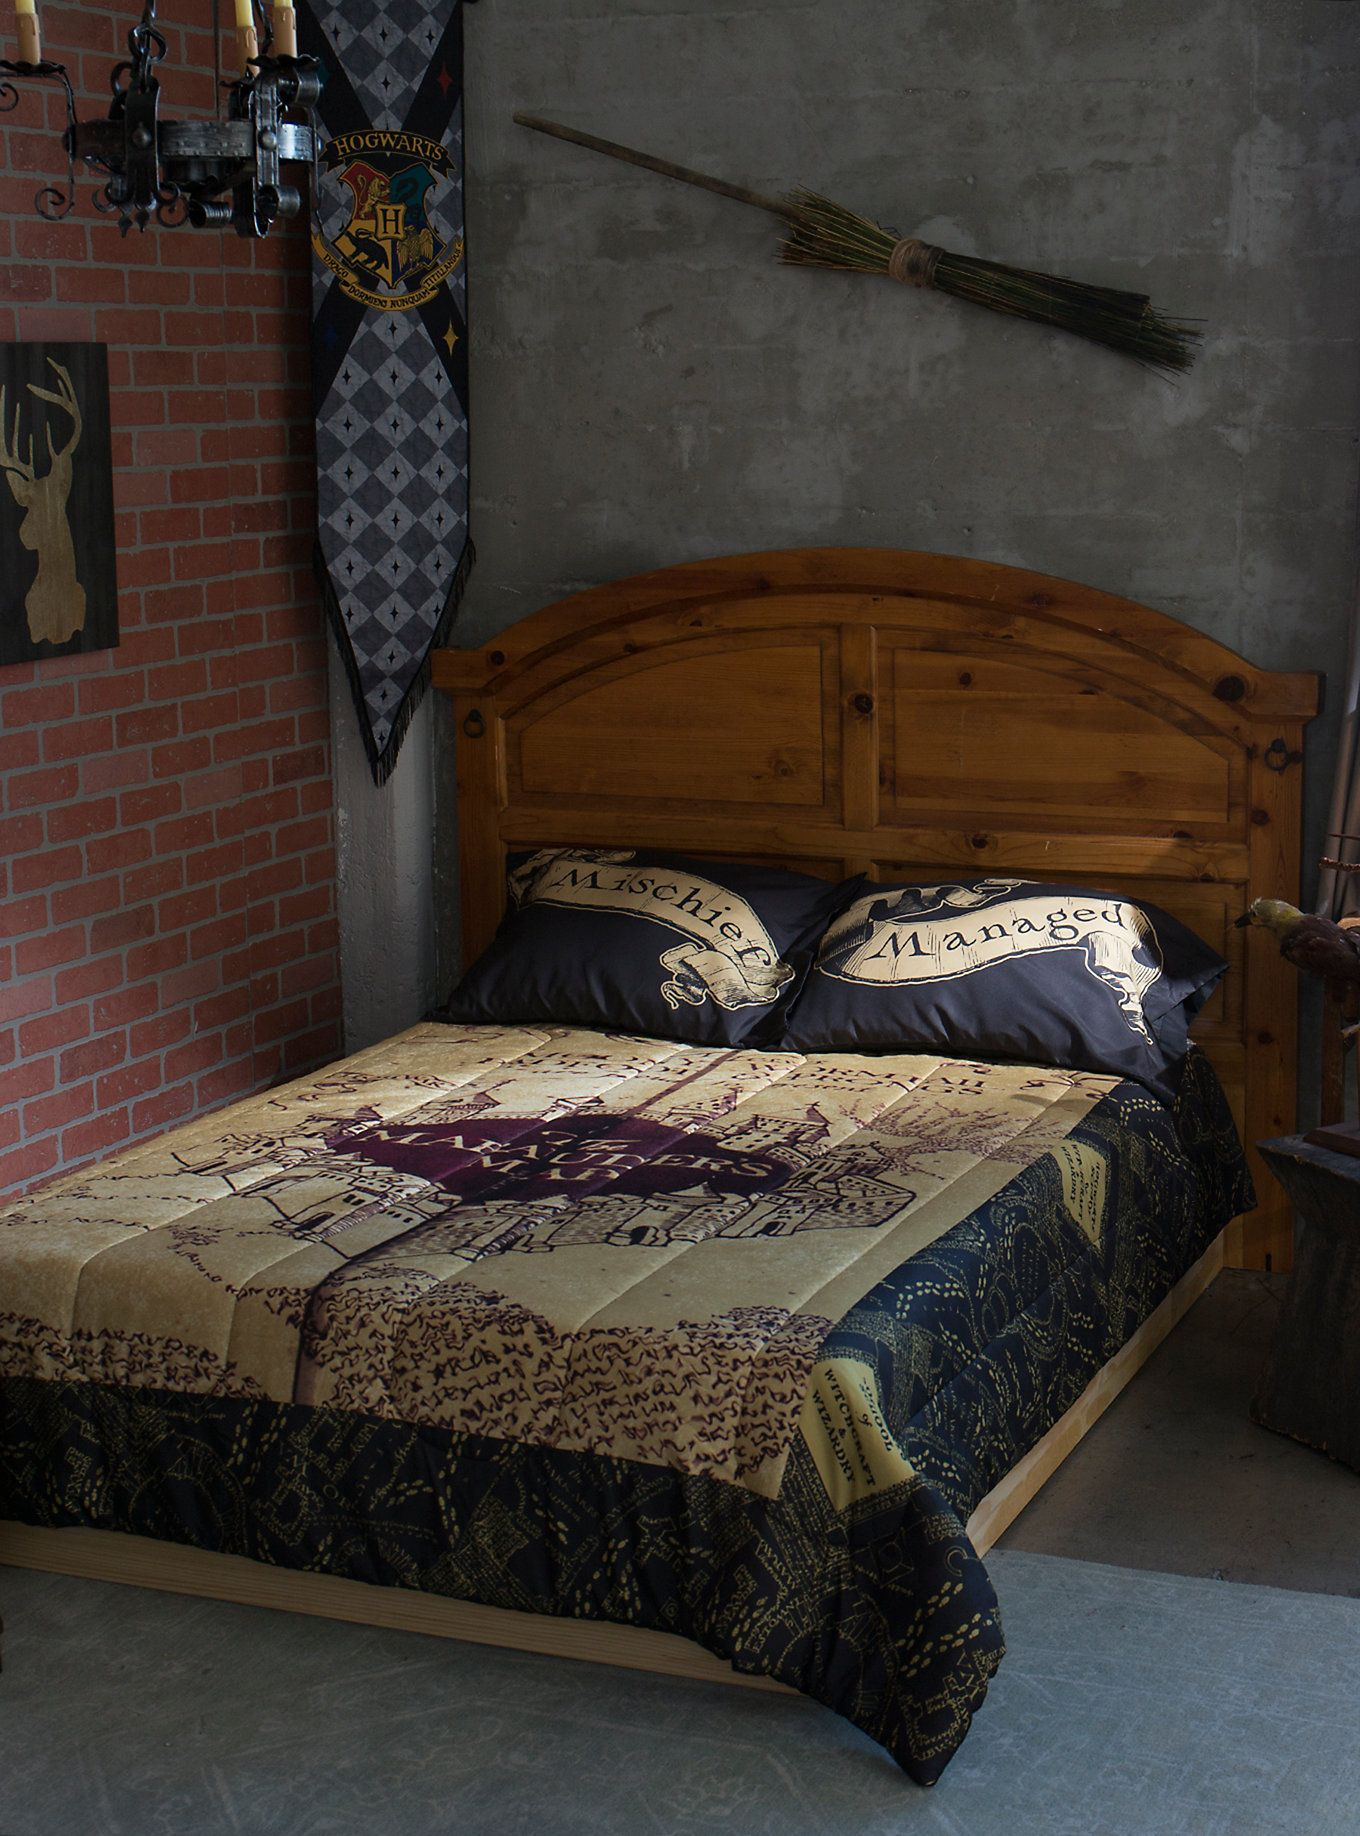 Harry Potter Bedding Set Harry Potter Room Decor Harry Potter